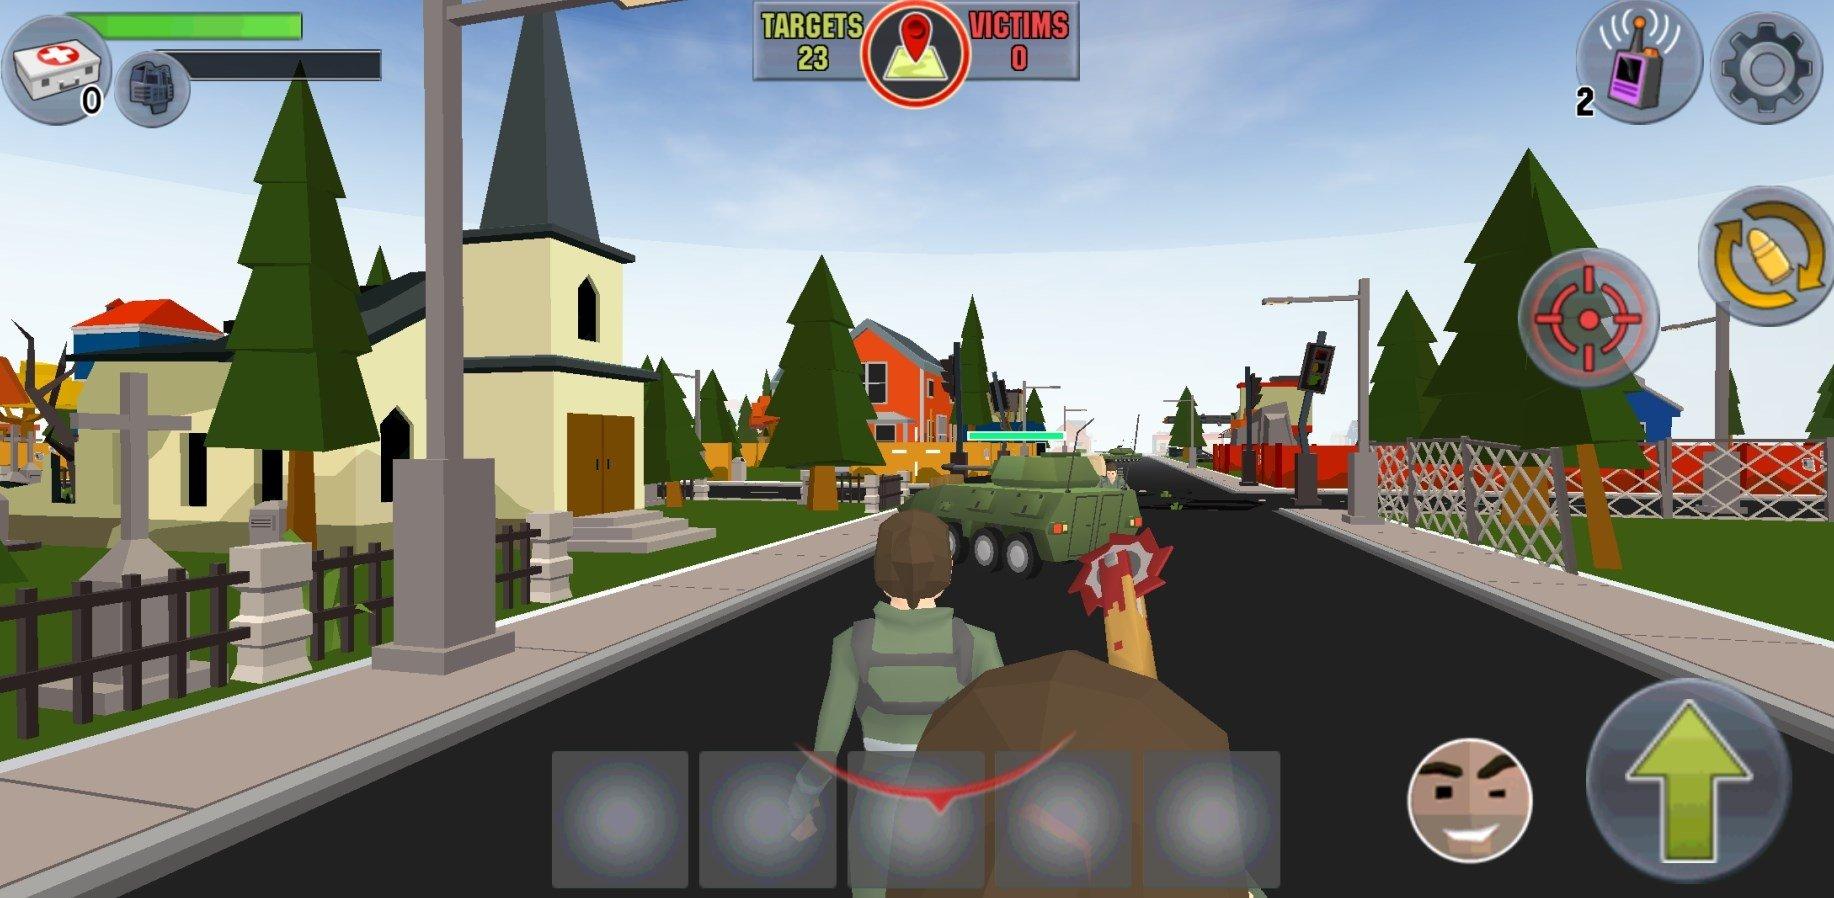 Battle Royale: FPS Shooter 1 10 04 - Descargar para Android APK Gratis